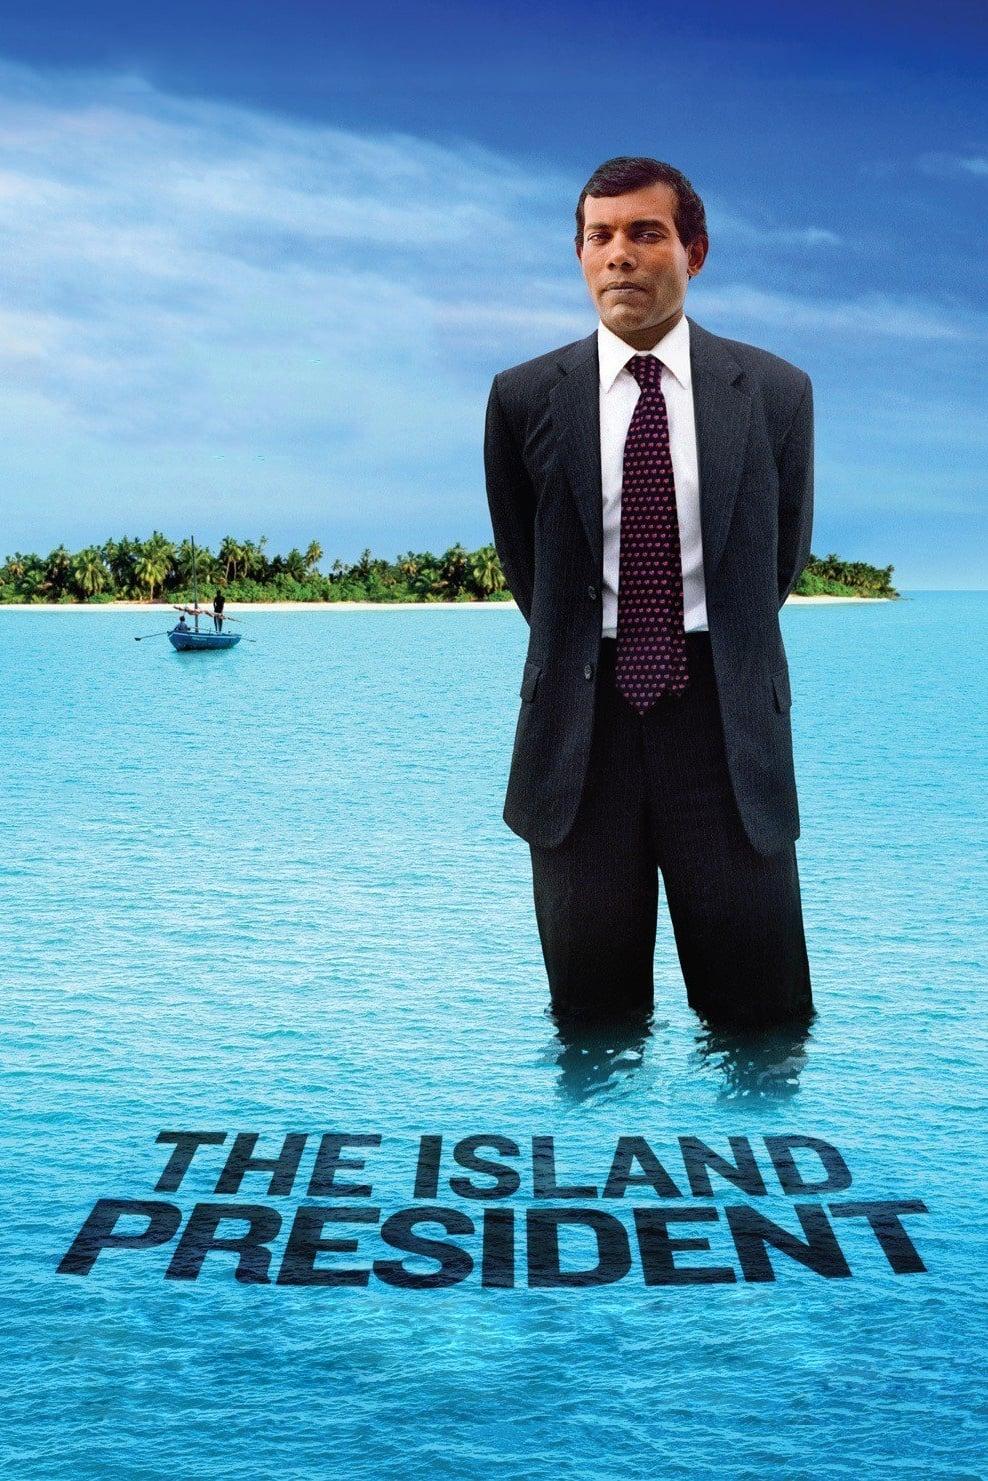 The Island President (2012)